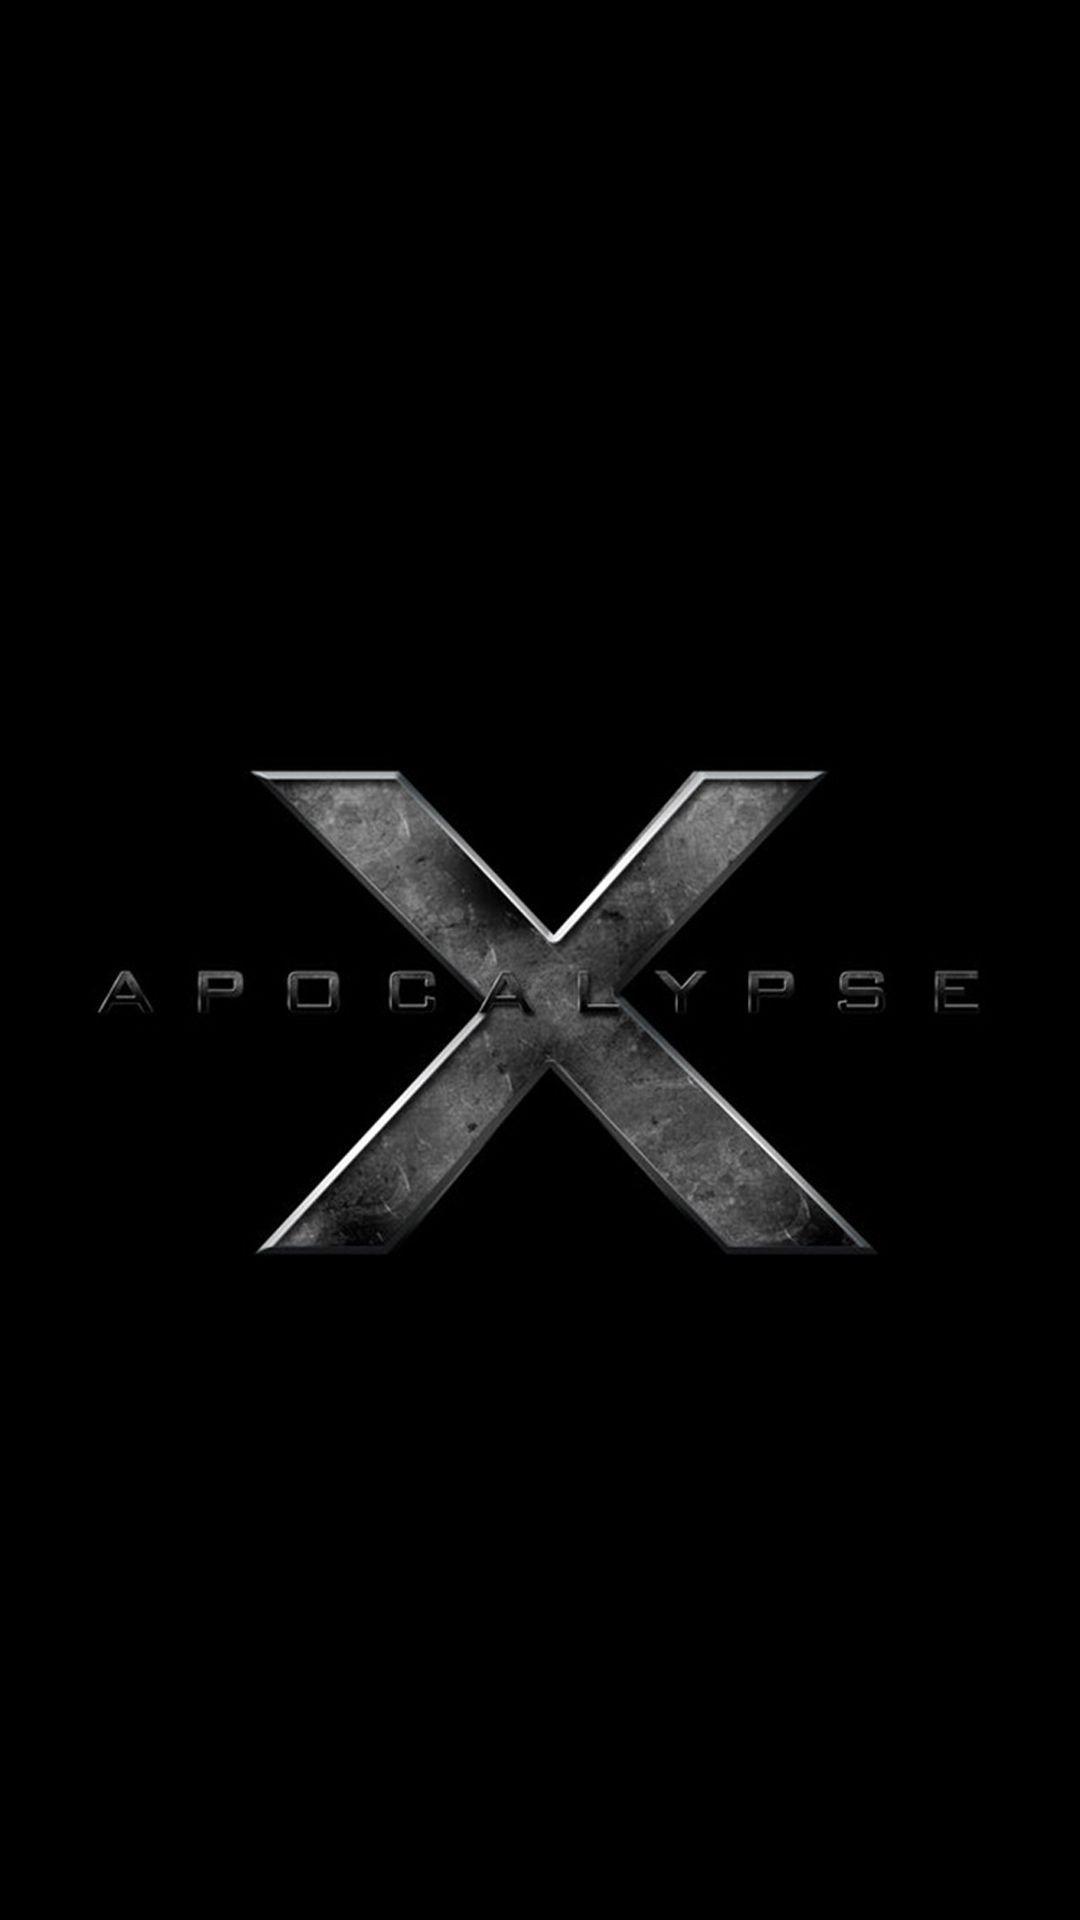 X Men Iphone Wallpapers Top Free X Men Iphone Backgrounds Wallpaperaccess